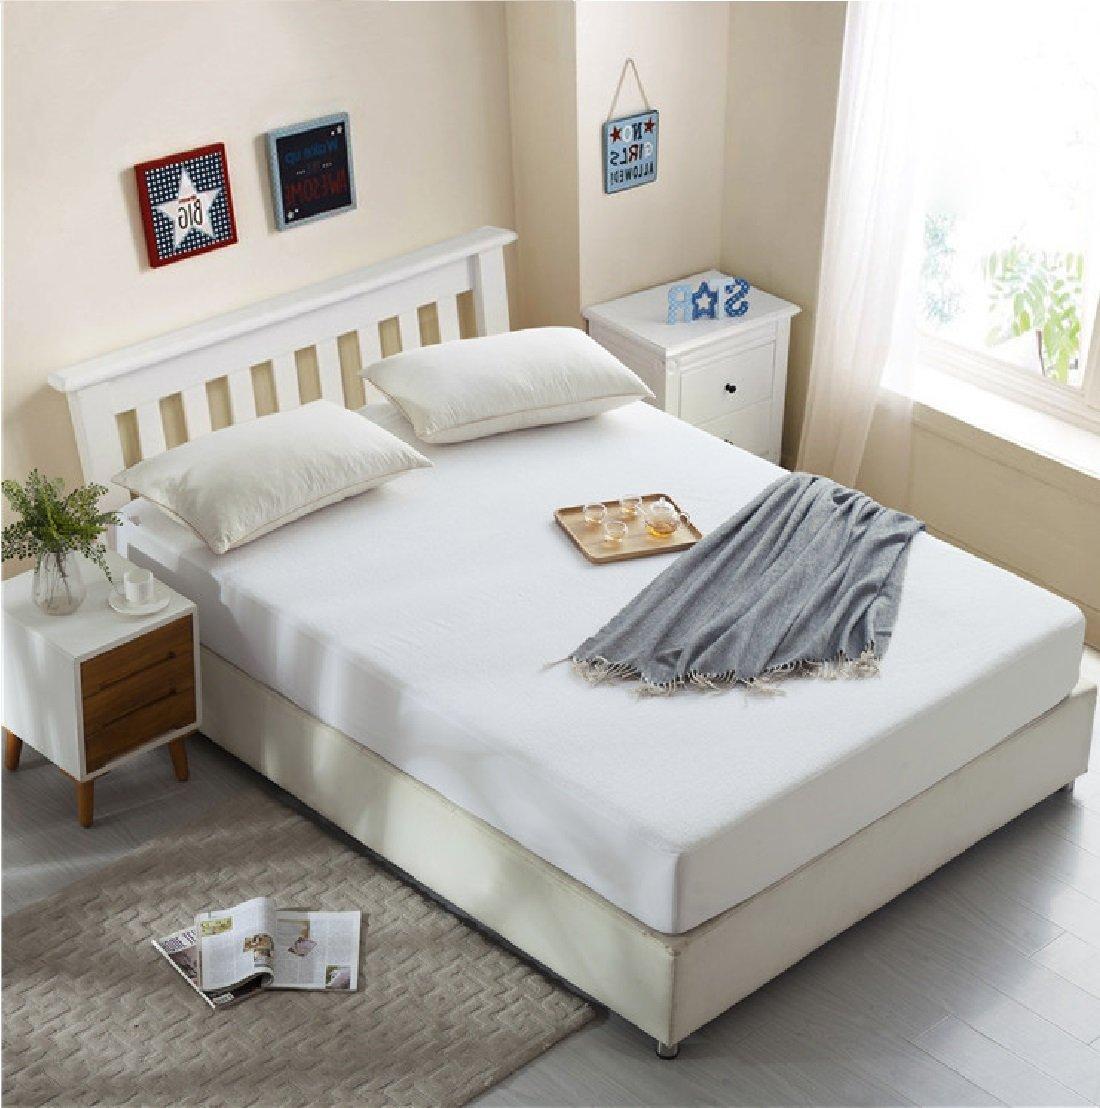 Dream CareTM Waterproof Dustproof Terry Cotton Mattress Protector for Single Bed - 80